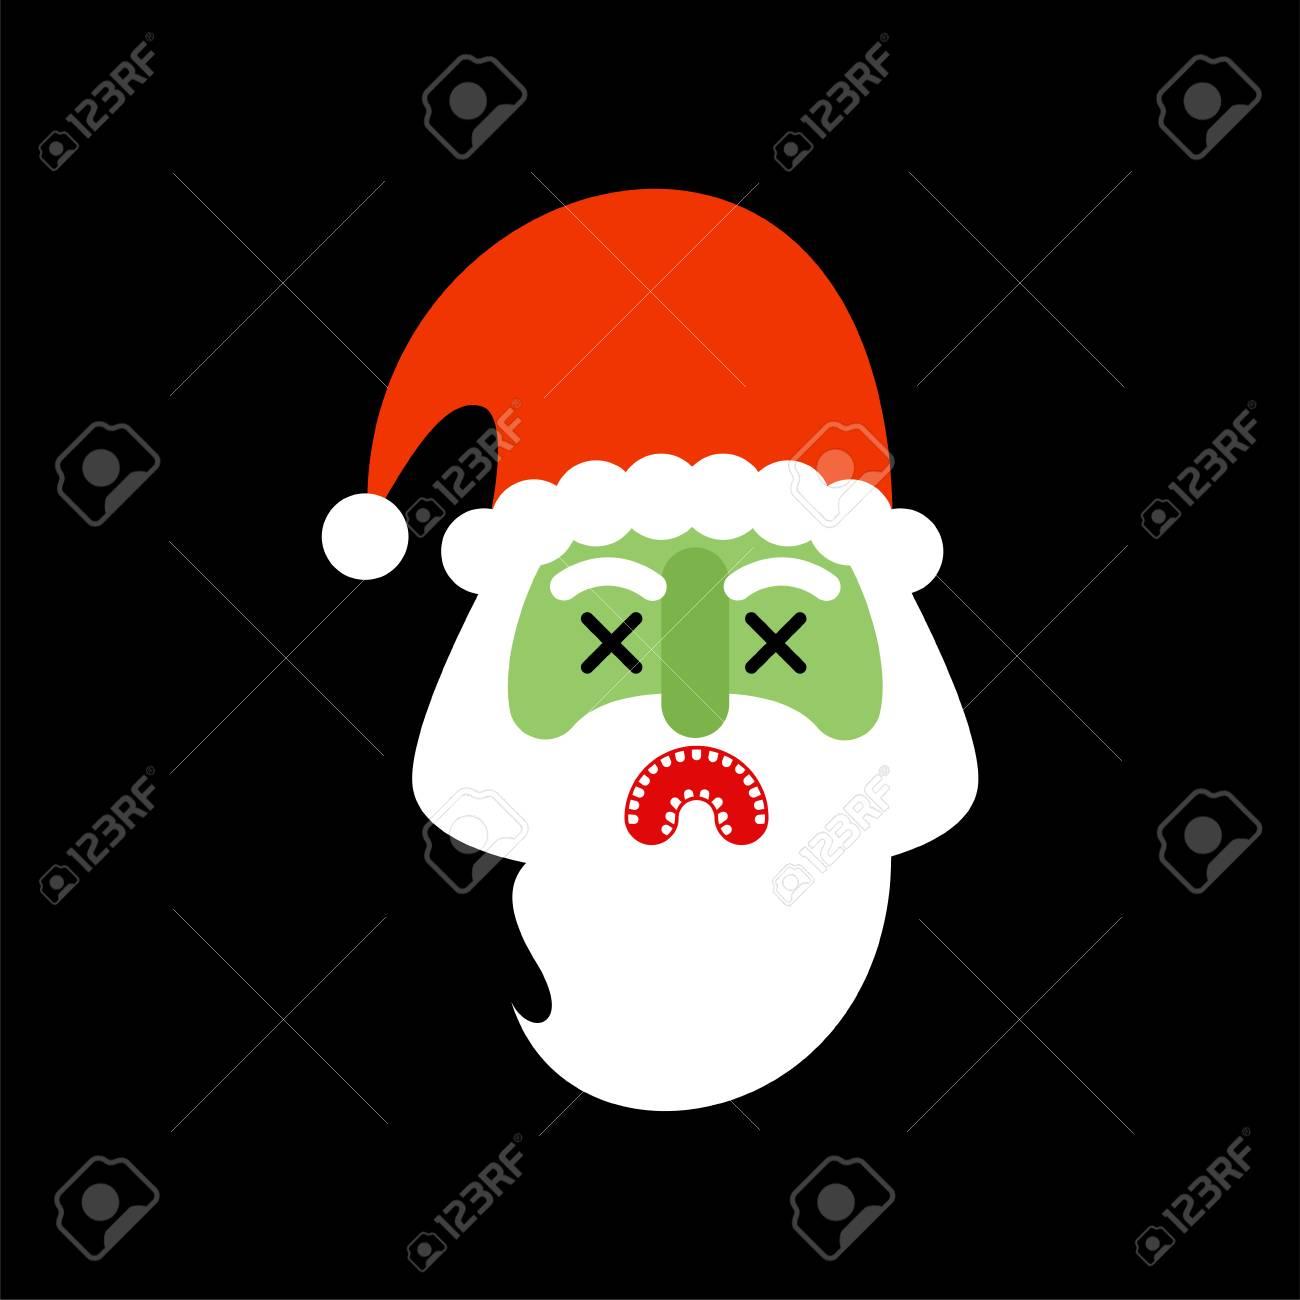 Christmas Zombie Santa.Santa Claus Zombie Christmas Grandfather Horror Halloween New